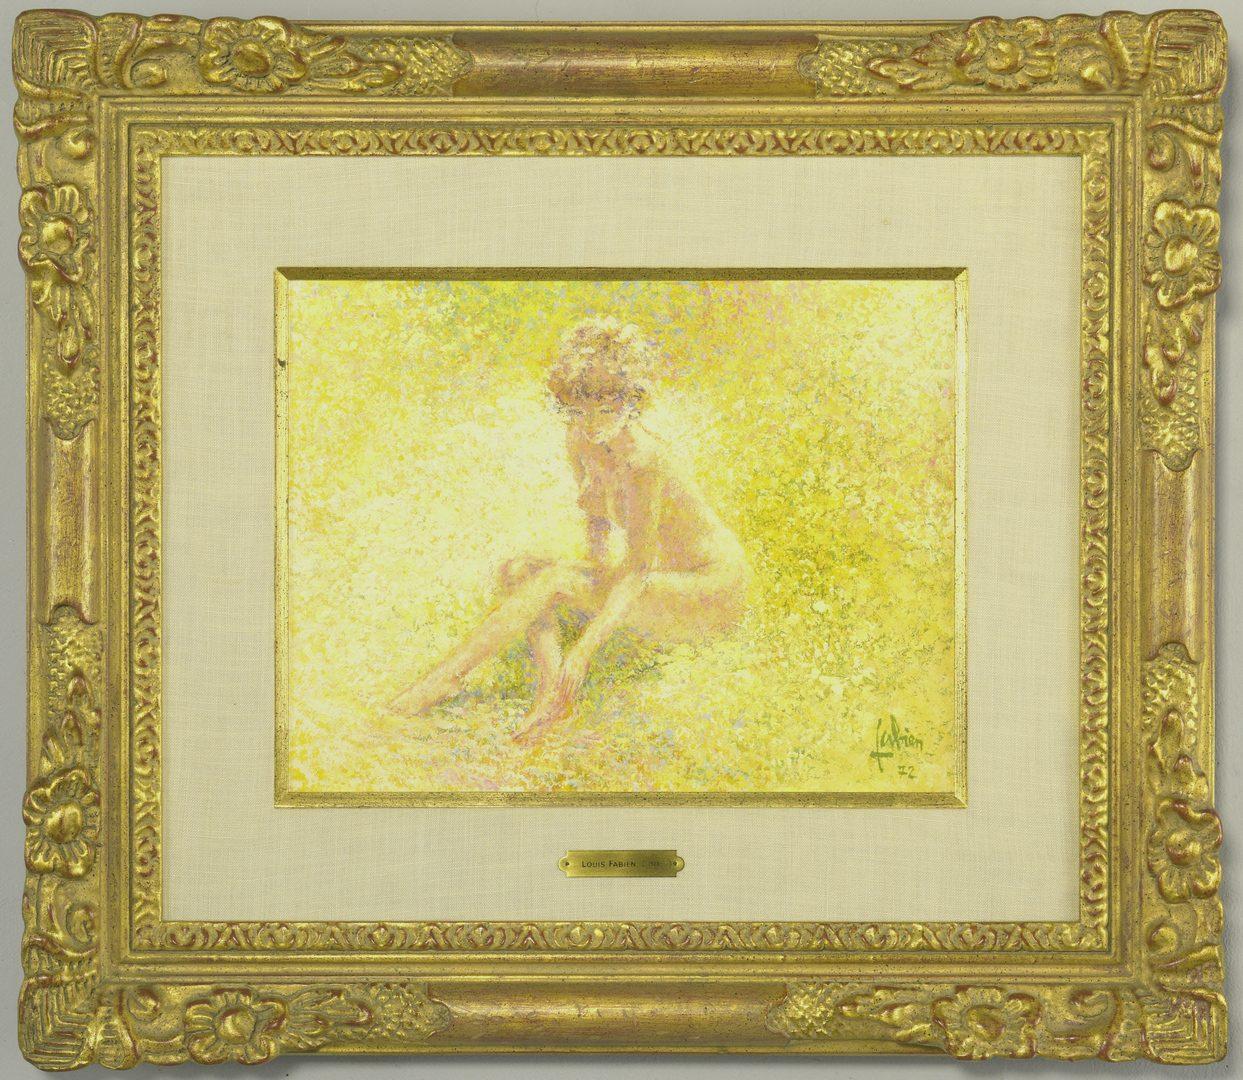 Lot 433: Louis Fabien Oil on Canvas Nude